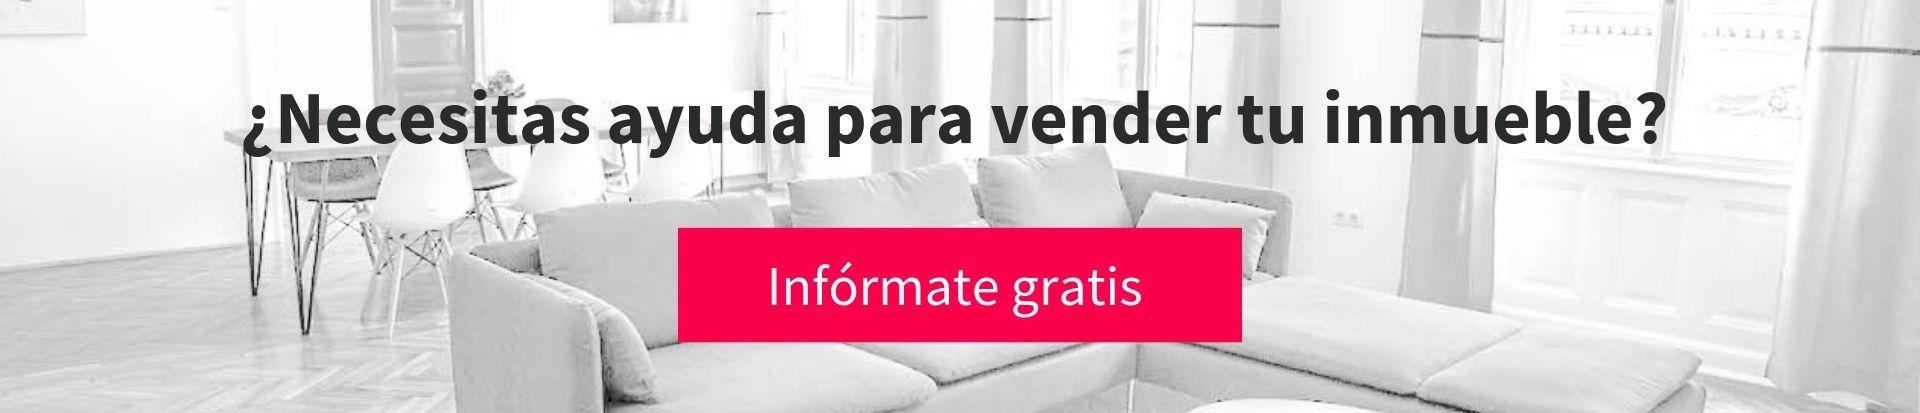 banner-informate-gratis